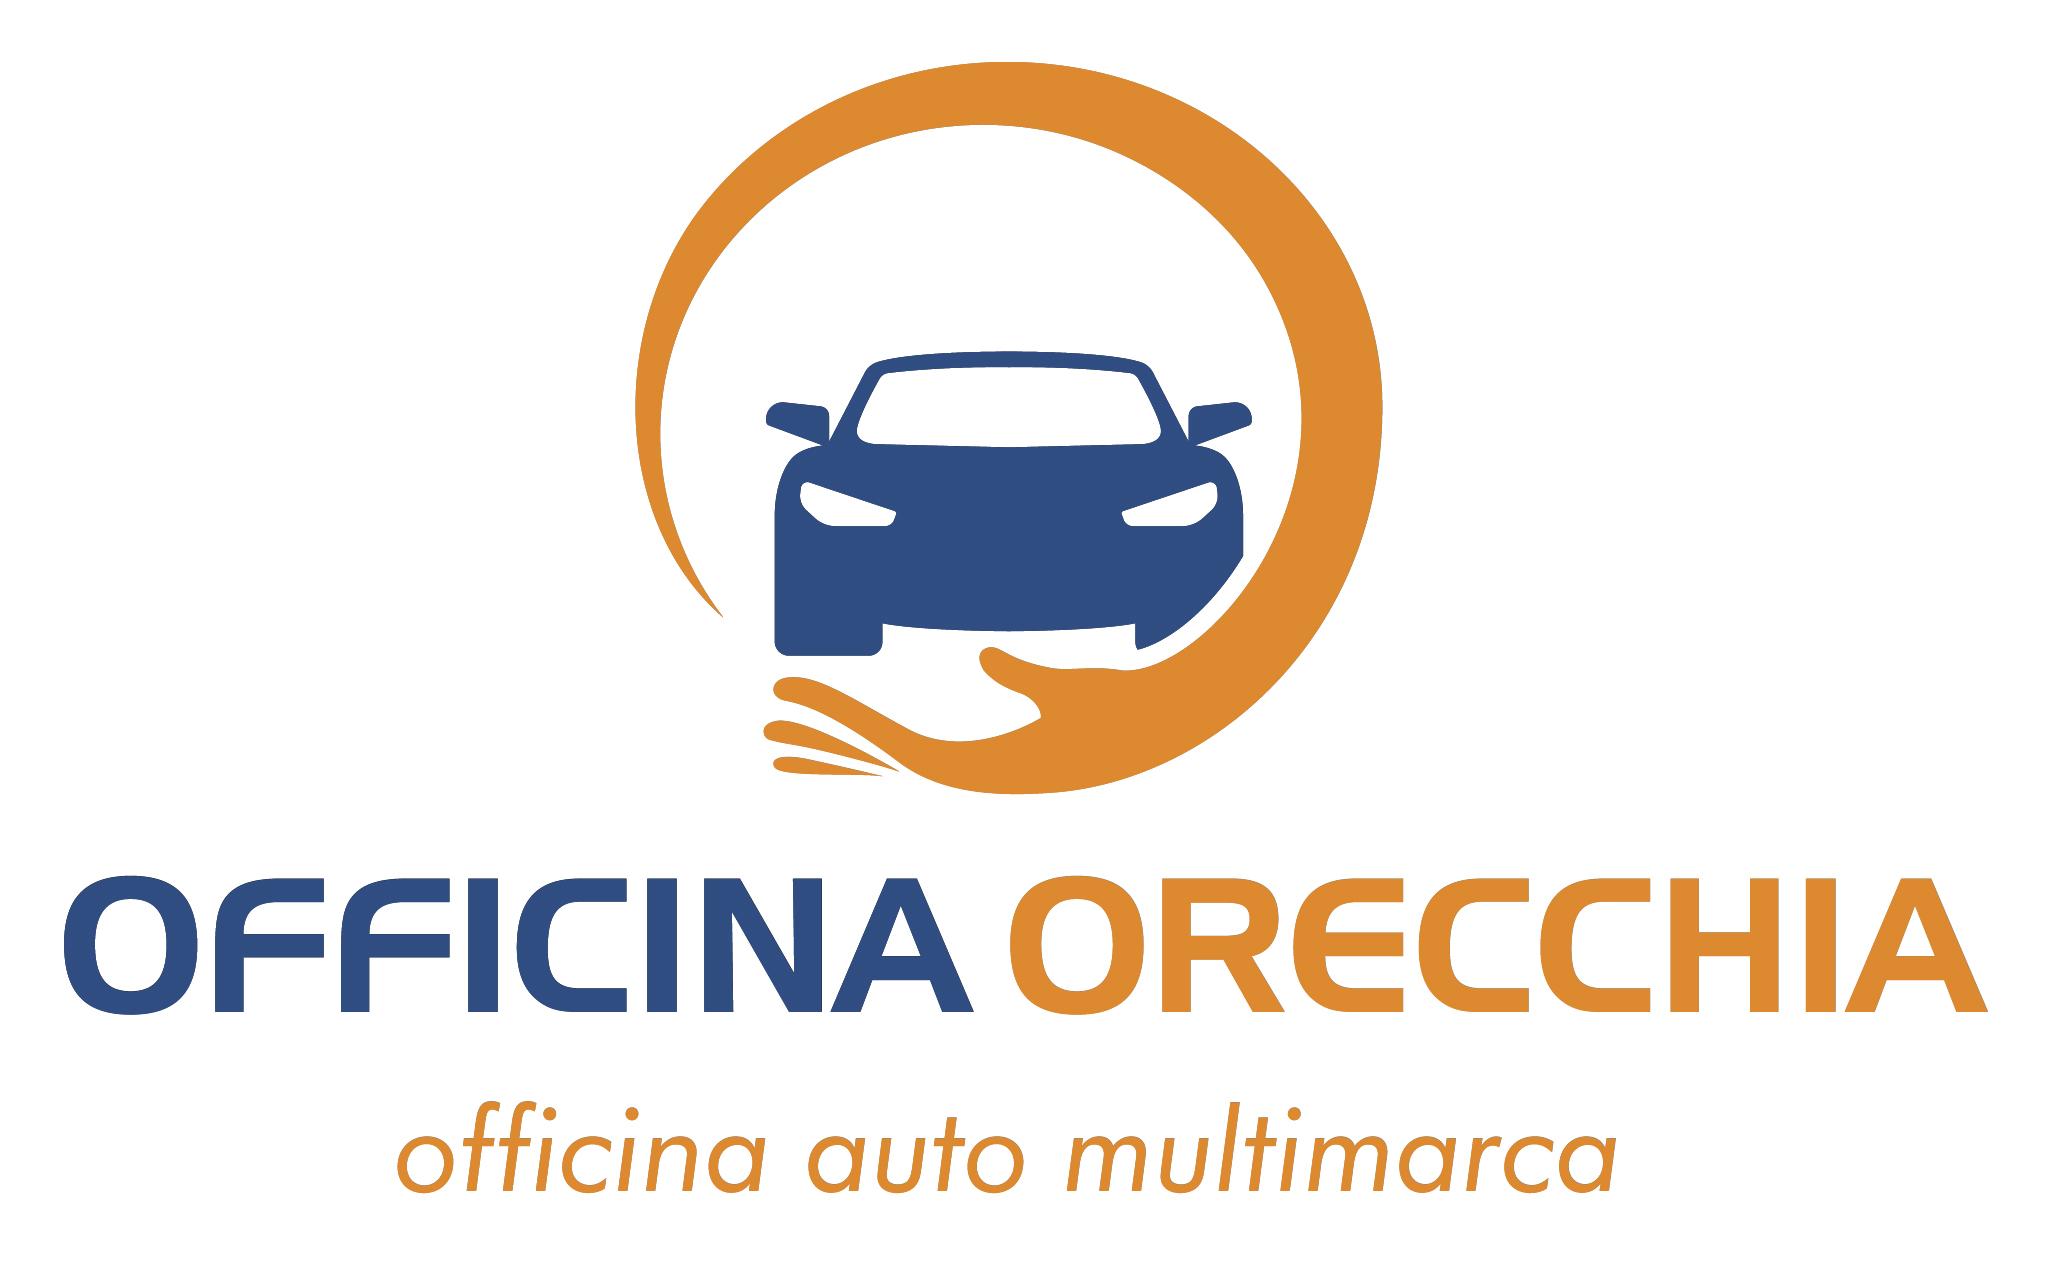 Officina Orecchia